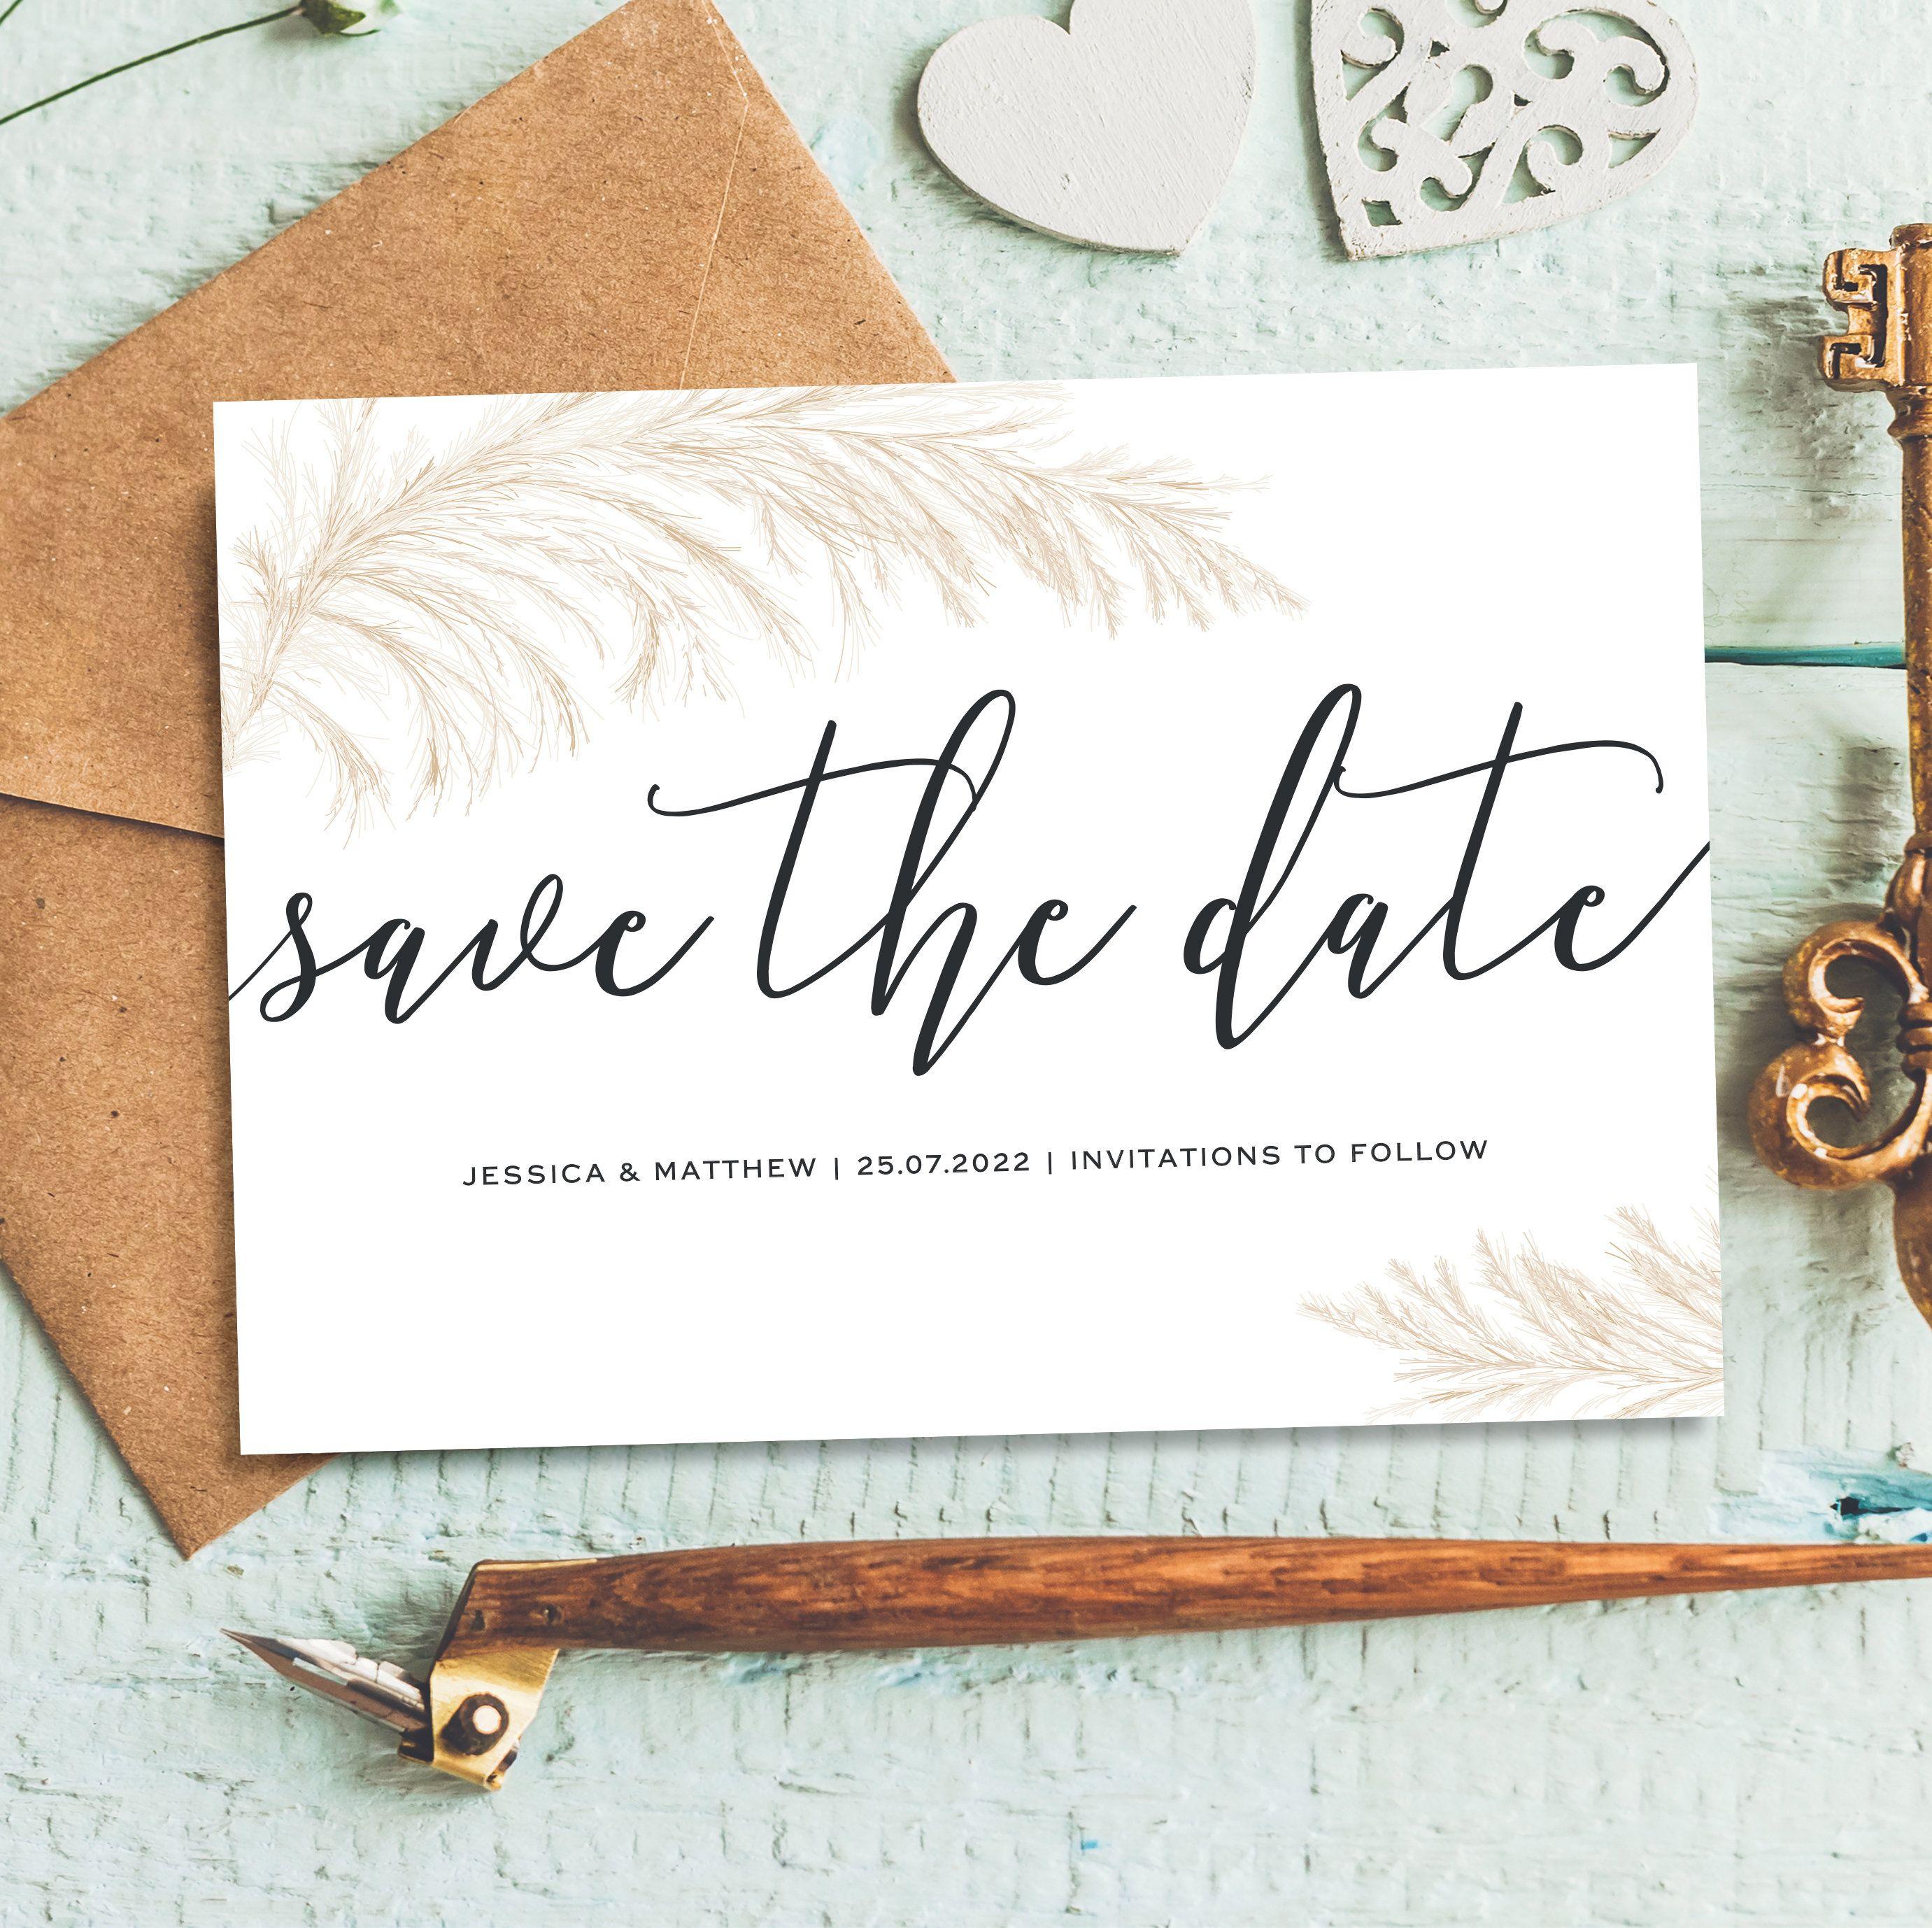 Kraft Lights Save The Date Modern Save The Date Postcard Etsy In 2020 Wedding Saving Wedding Save The Dates Save The Date Cards